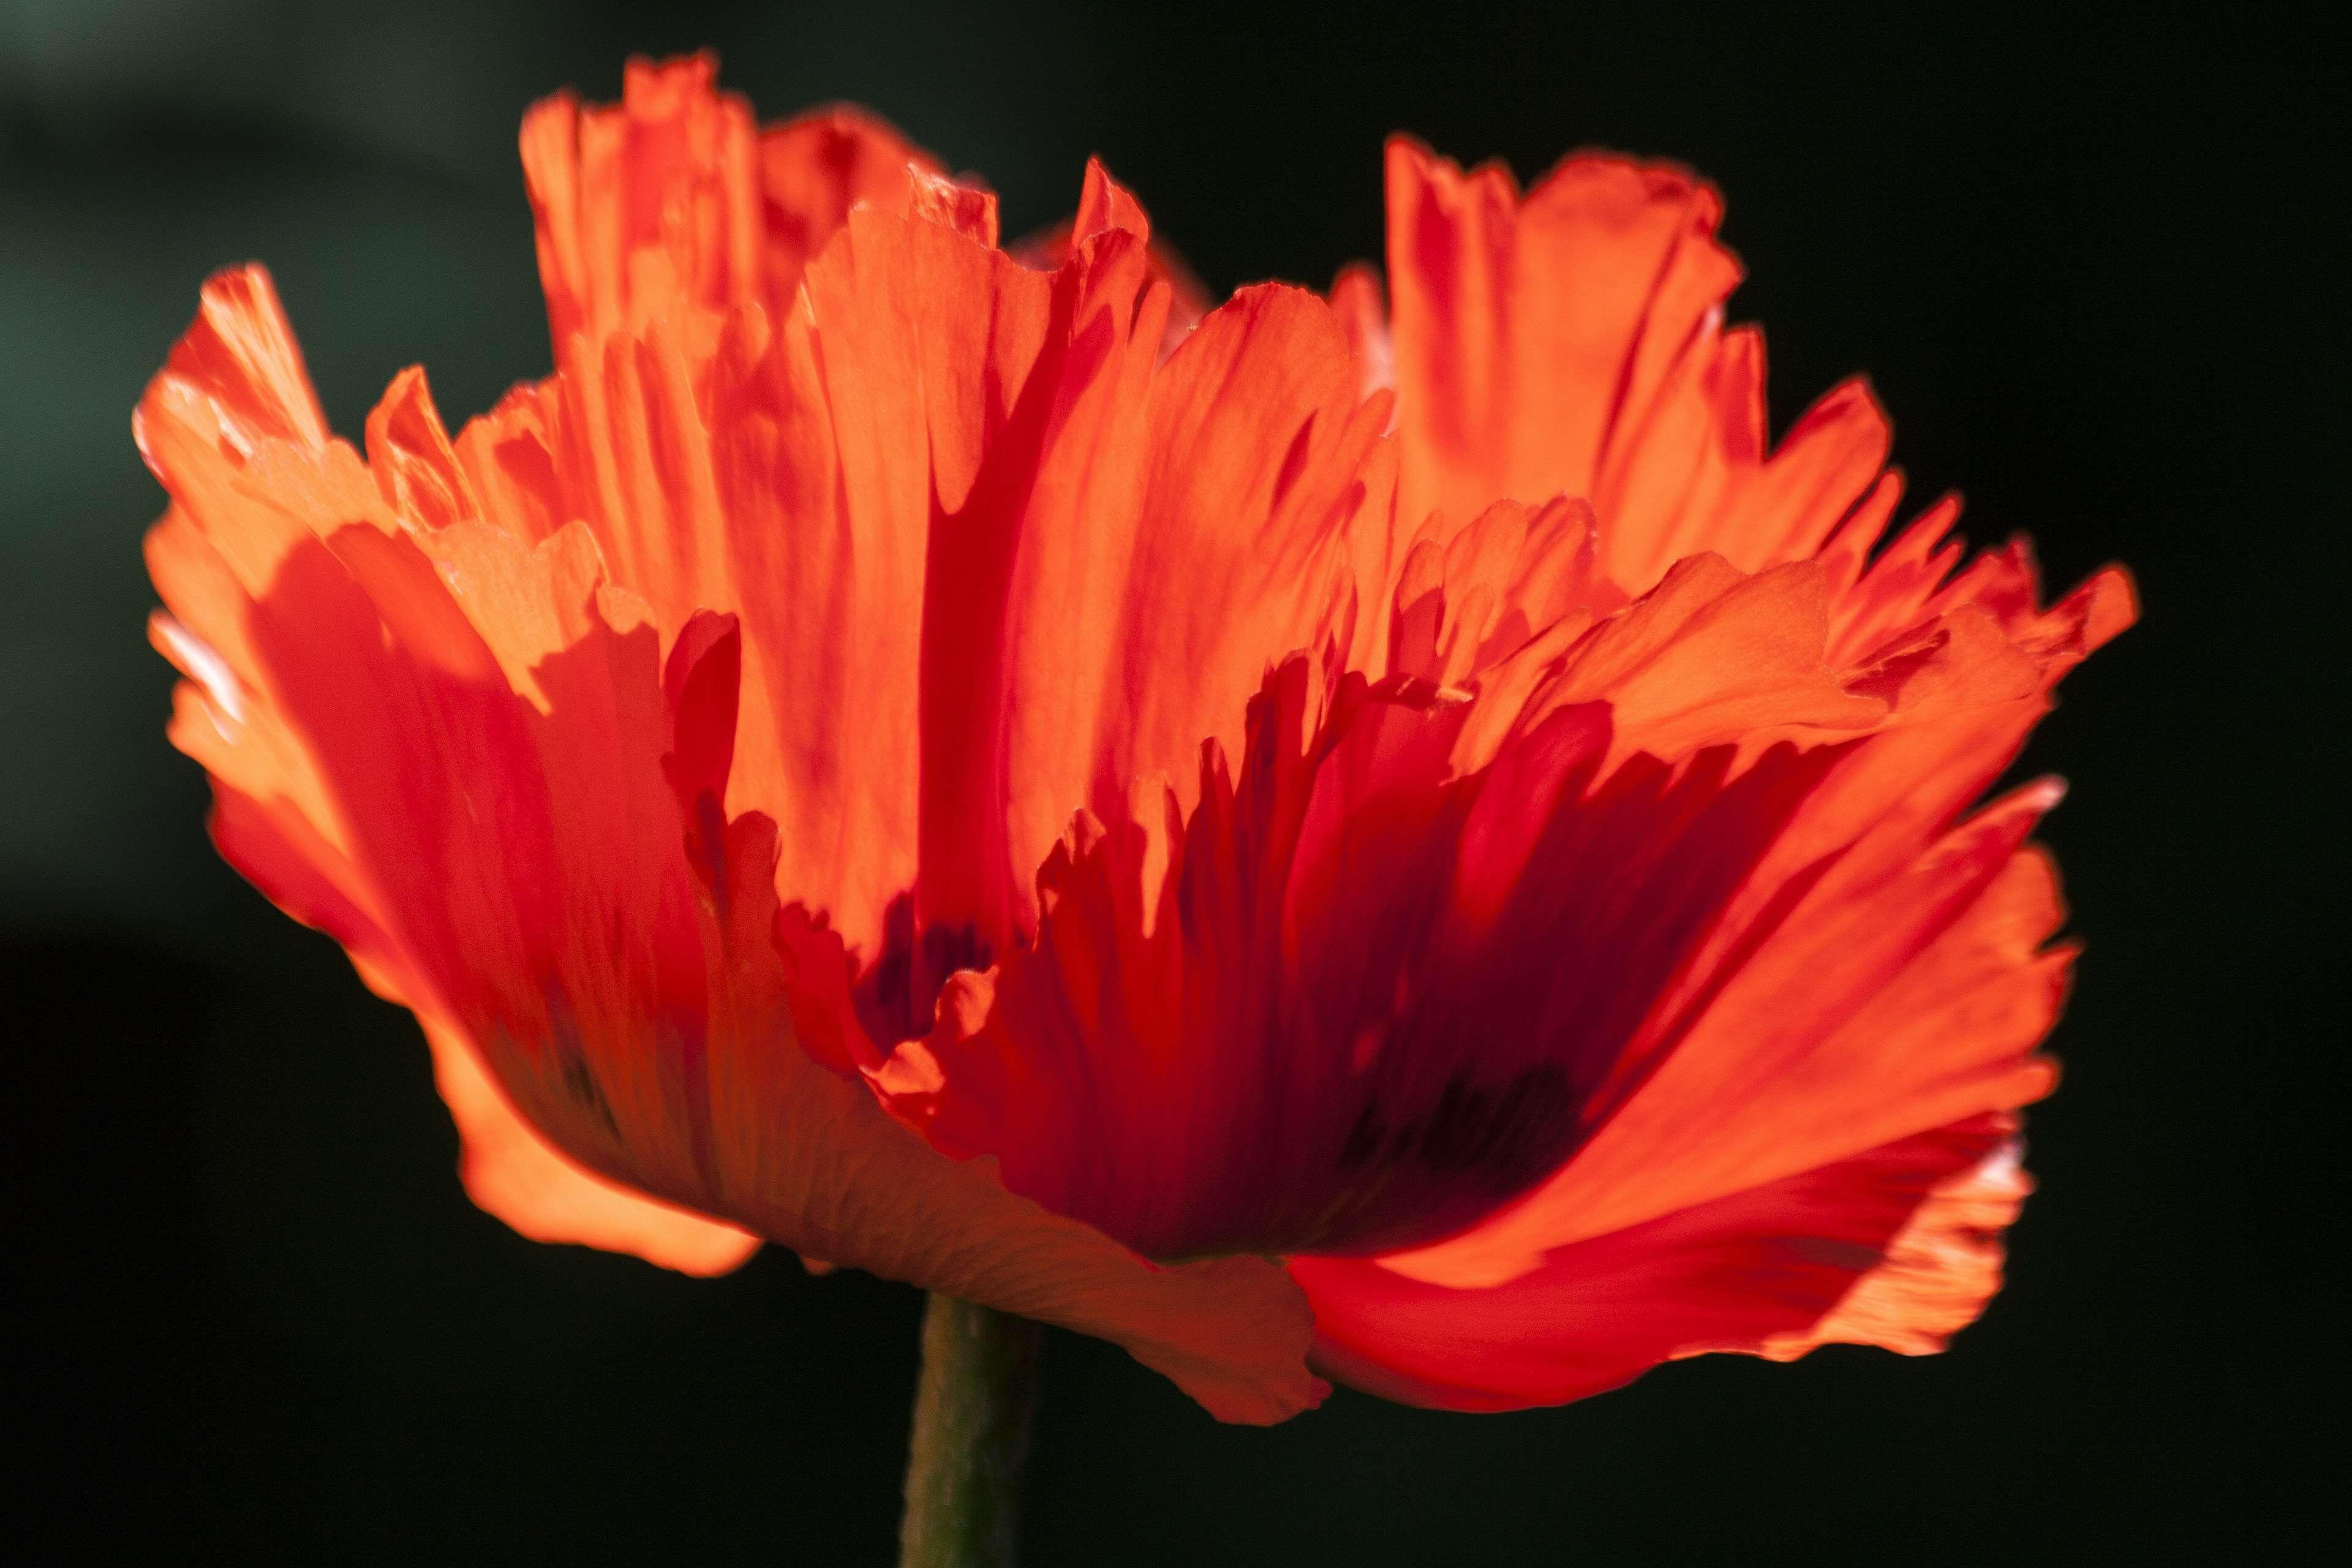 Bloom Blossom Close Up Flora Flower Hd Wallpaper Nature Poppy